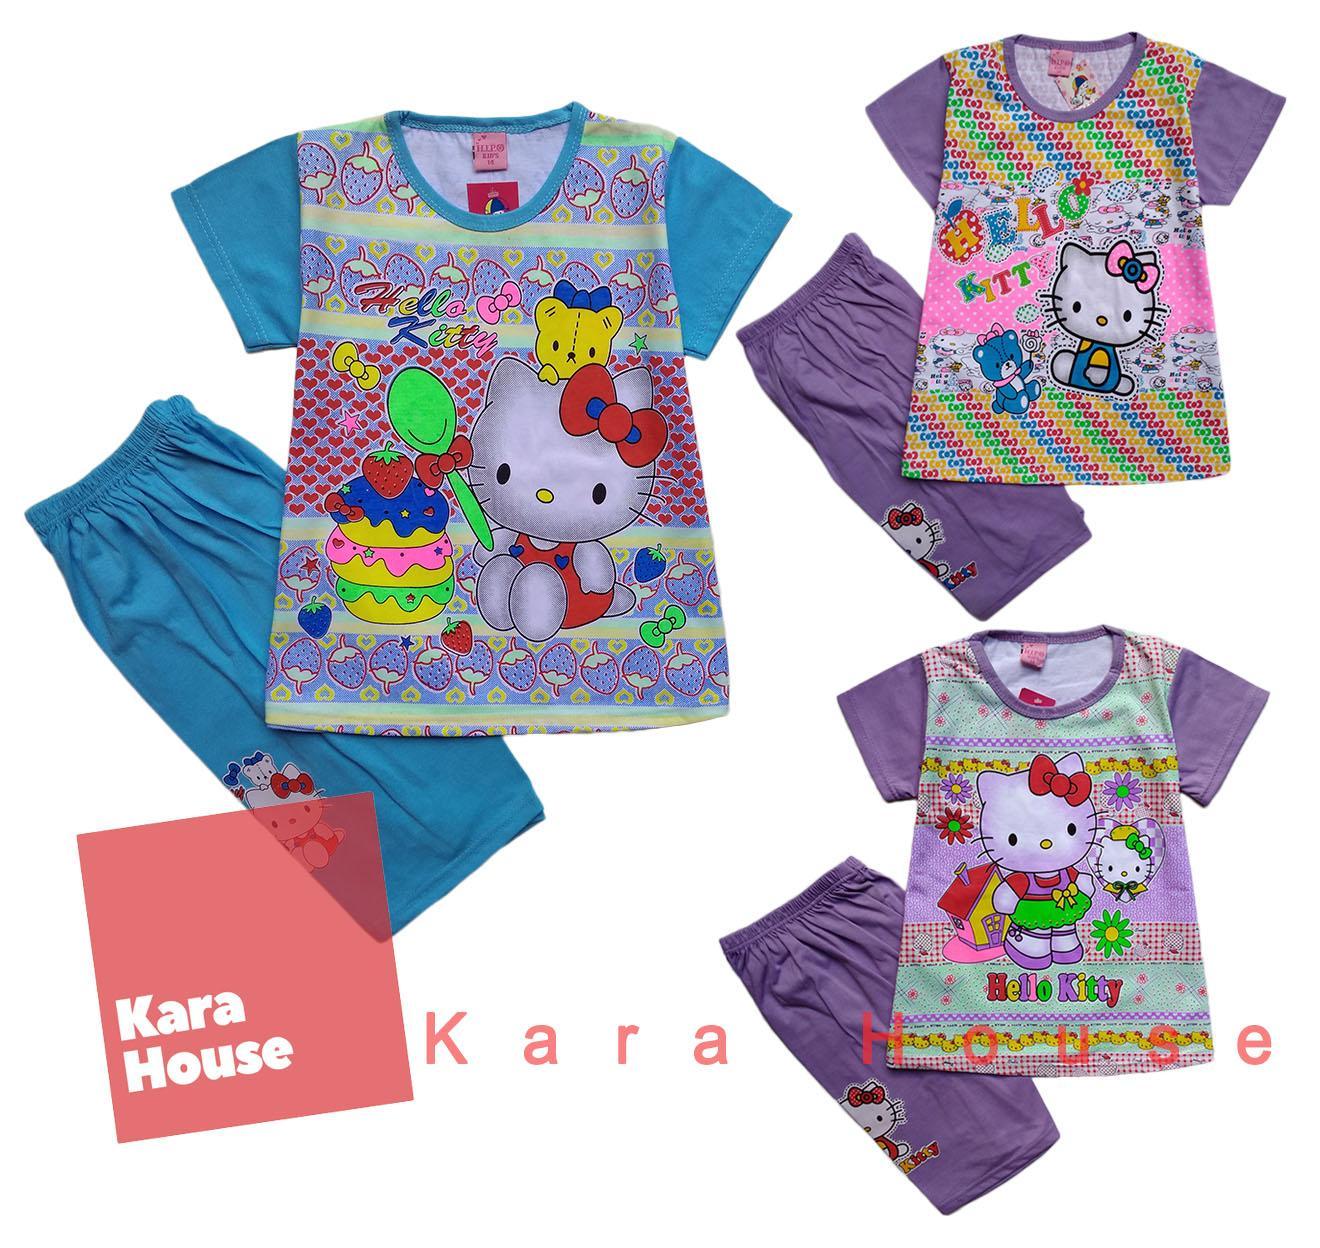 Segini Daftar Harga Baju Setelan Hello Kitty Murah Terbaru 2018 Katalog Hellokitty Kaos Atasan T Shirt Anak